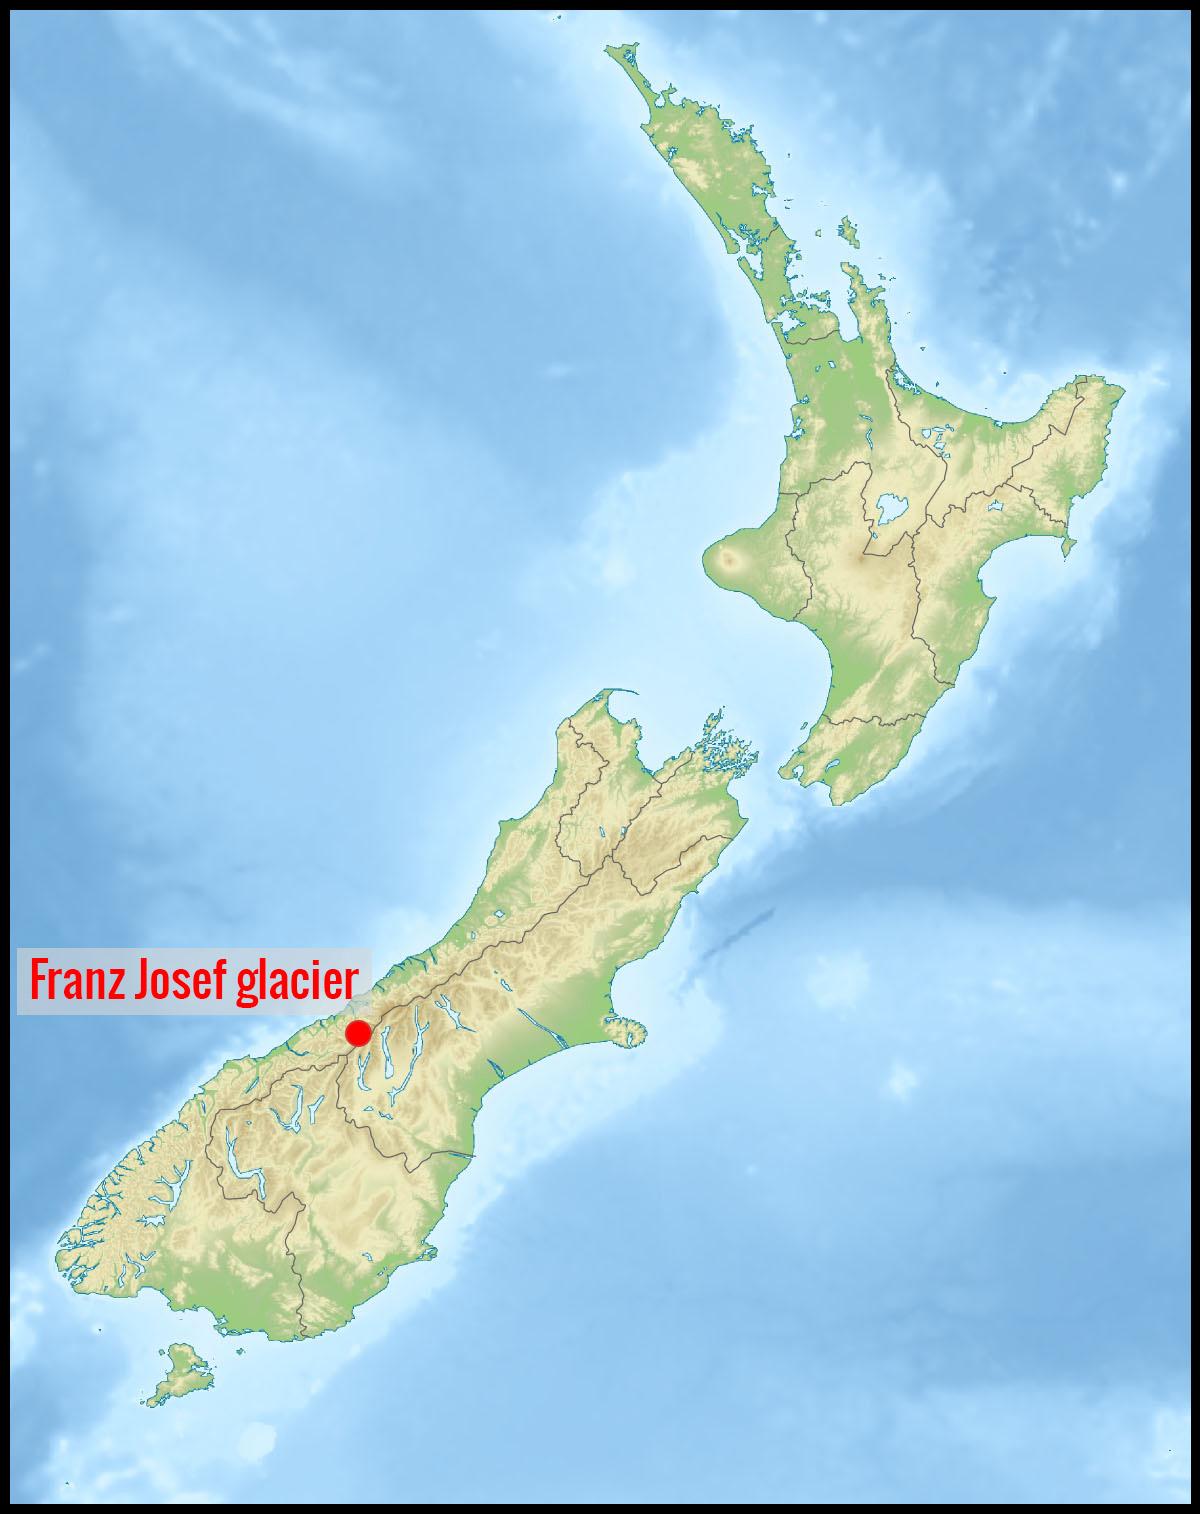 Carte Franz Josef glacier en Nouvelle-Zélande